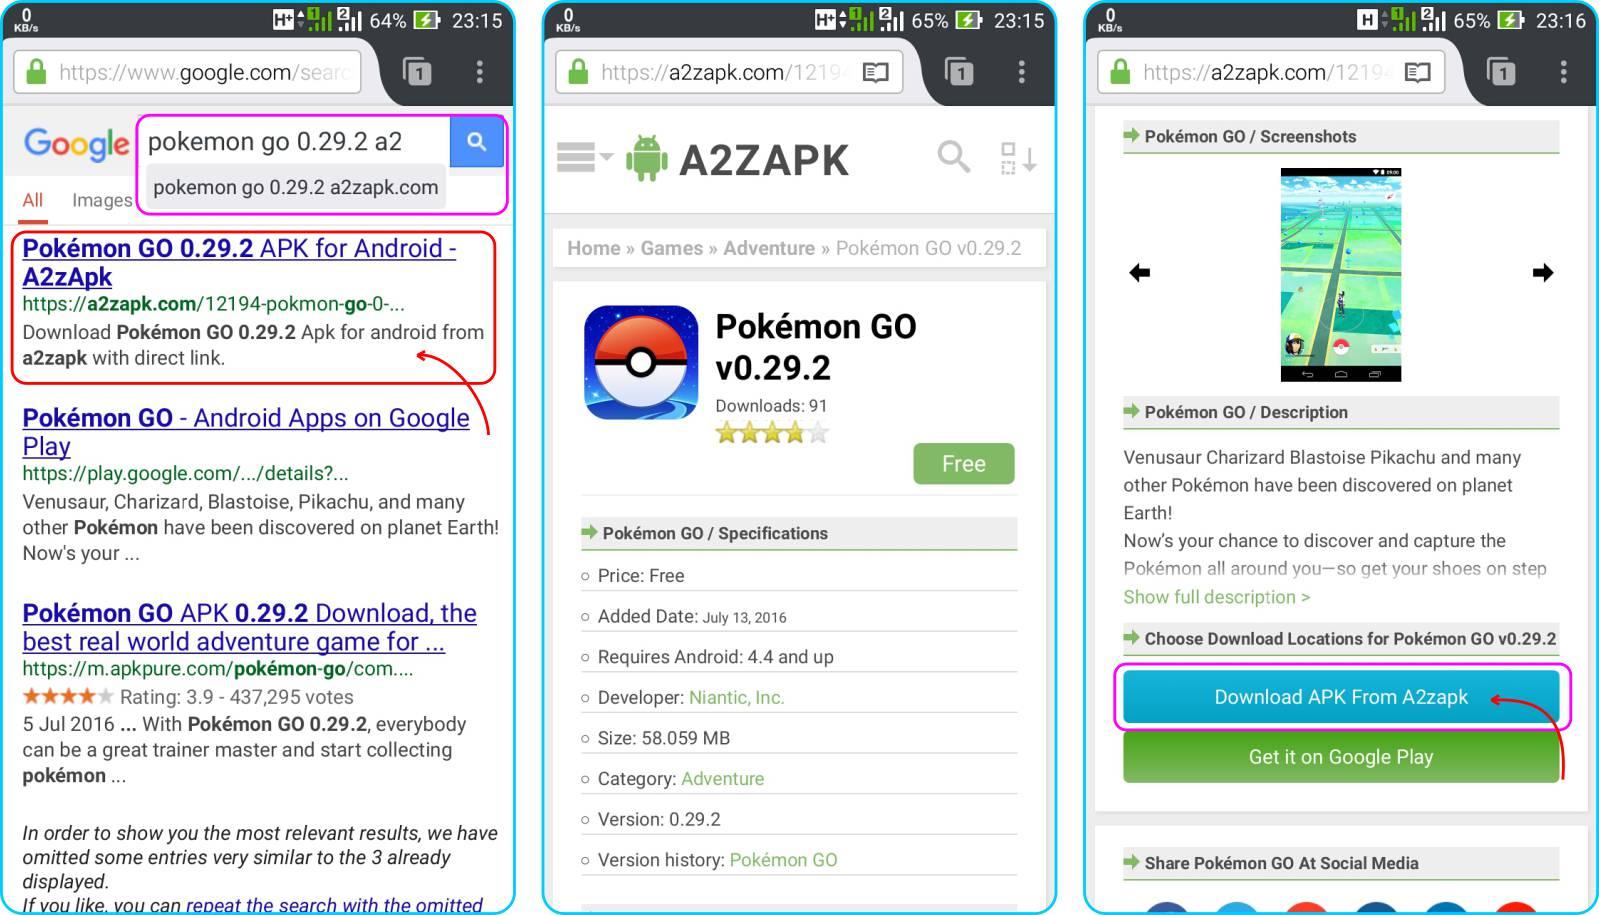 Cara Install Pokemon GO - Kunjungi Situs Penyedia APK Pokemon GO